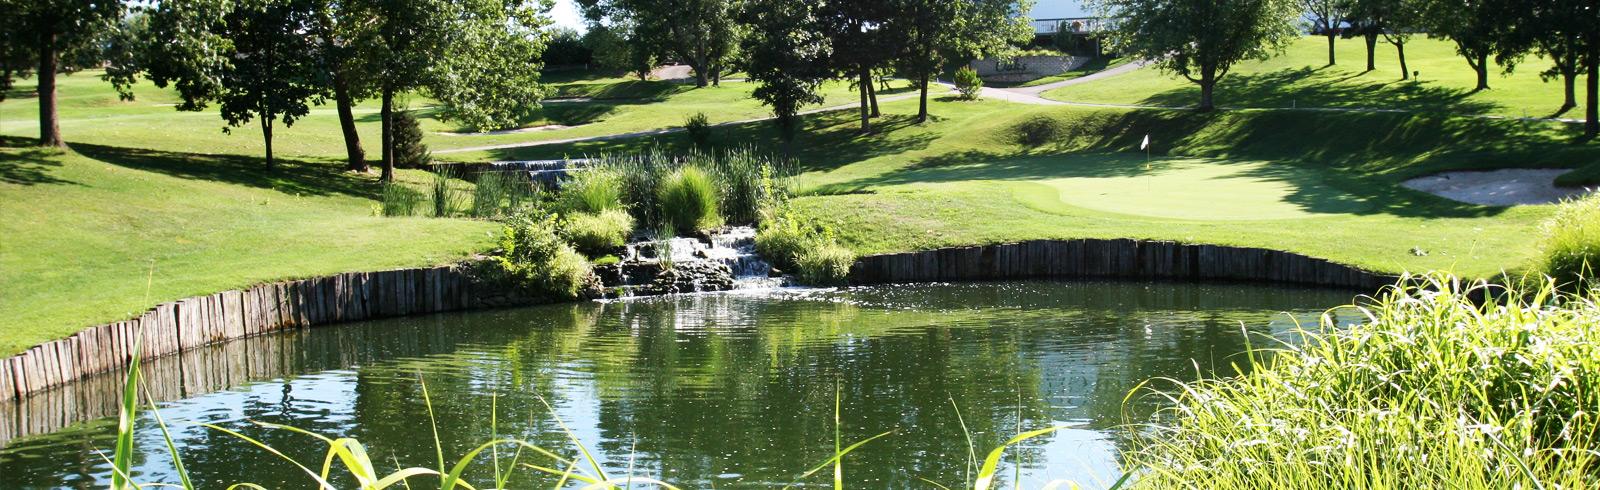 Tan-Tar-A Resort - Golf Memberships